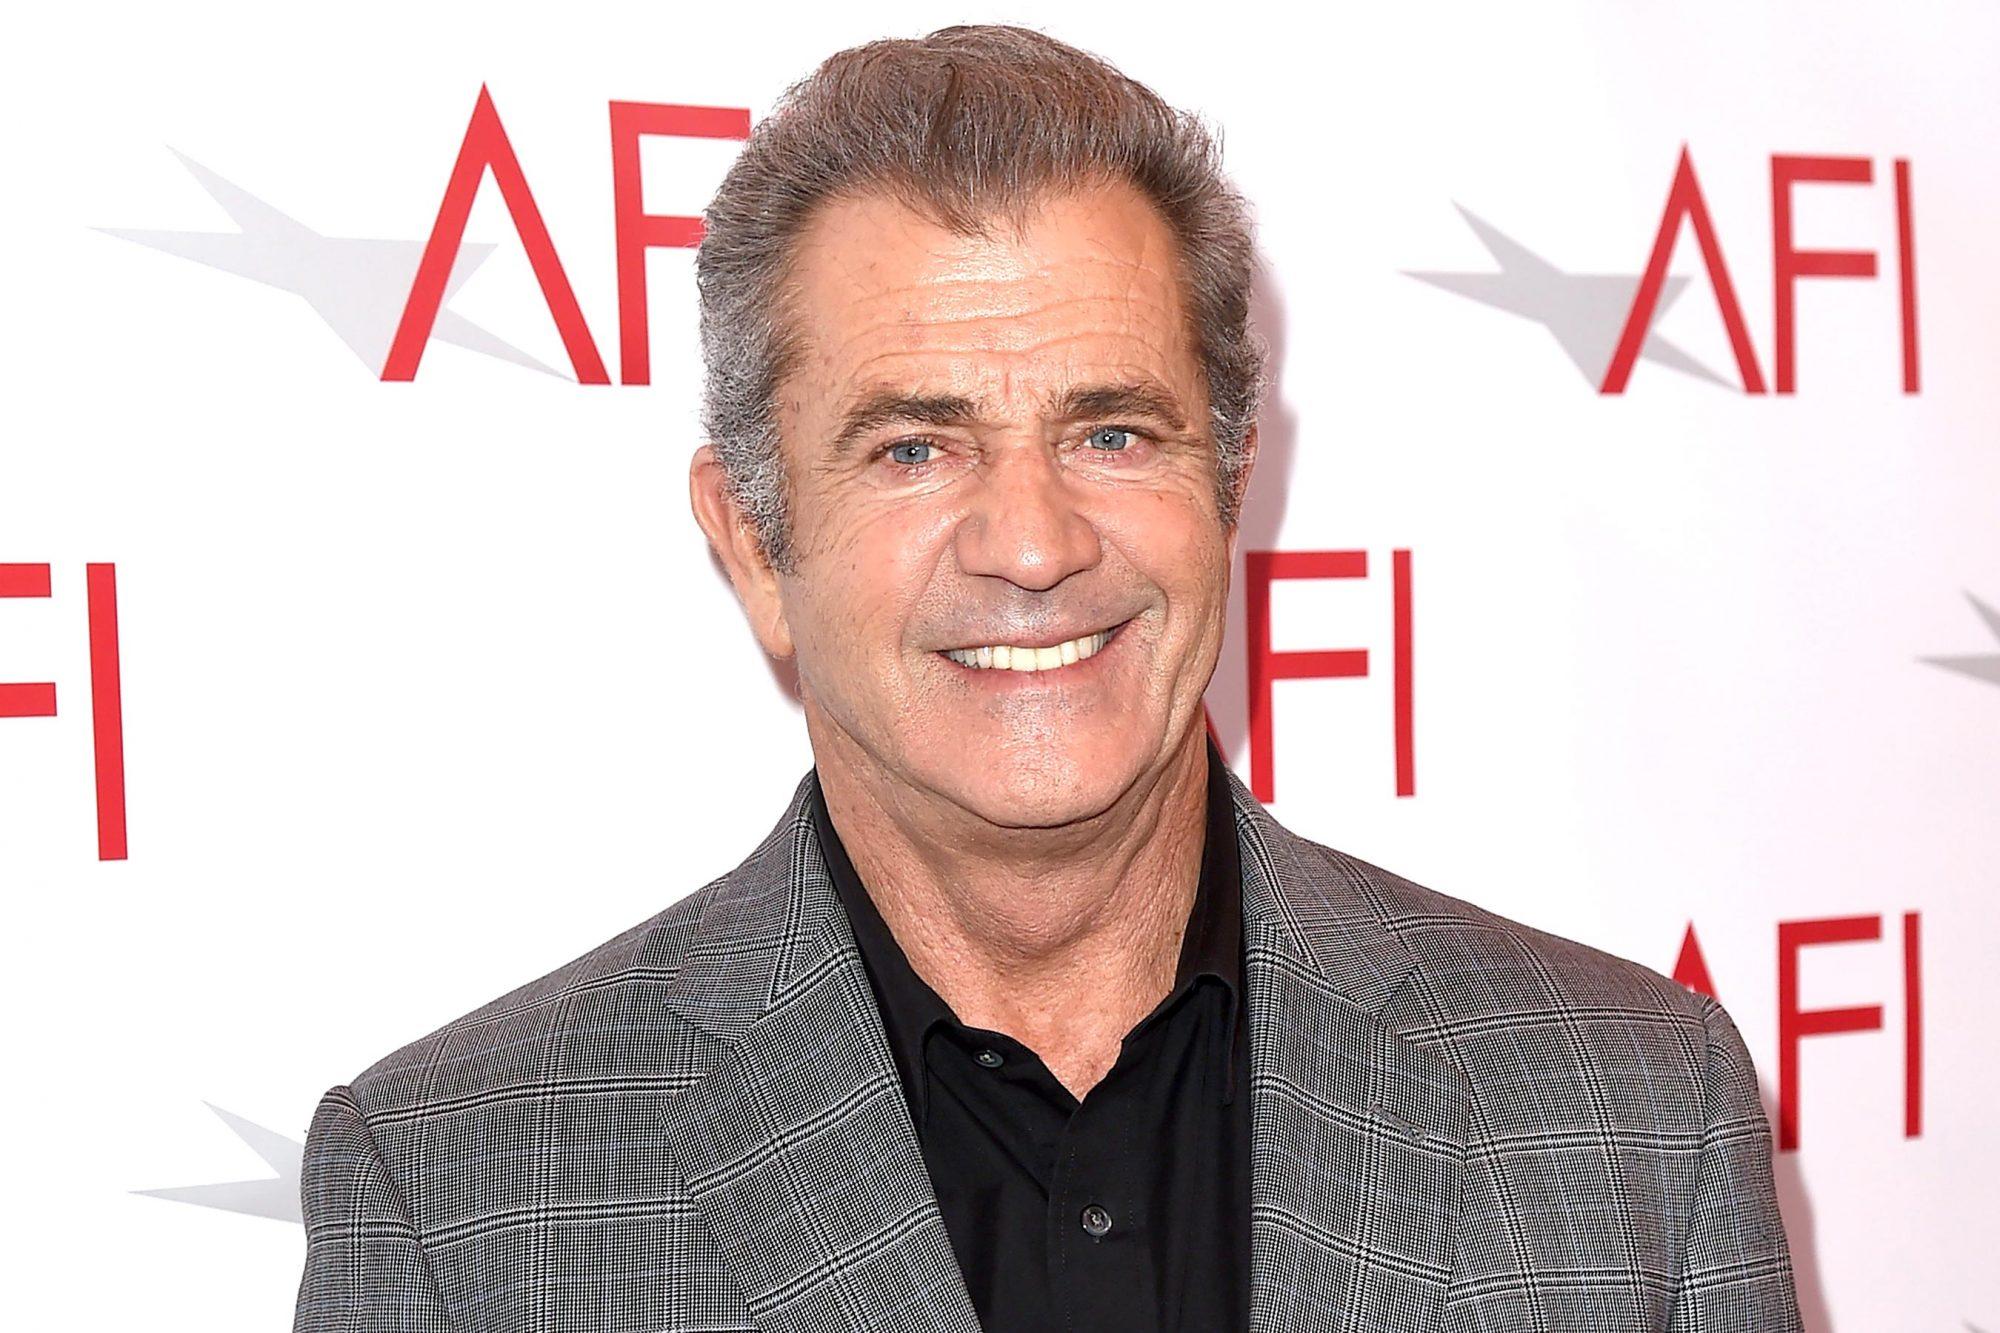 17th Annual AFI Awards - Red Carpet